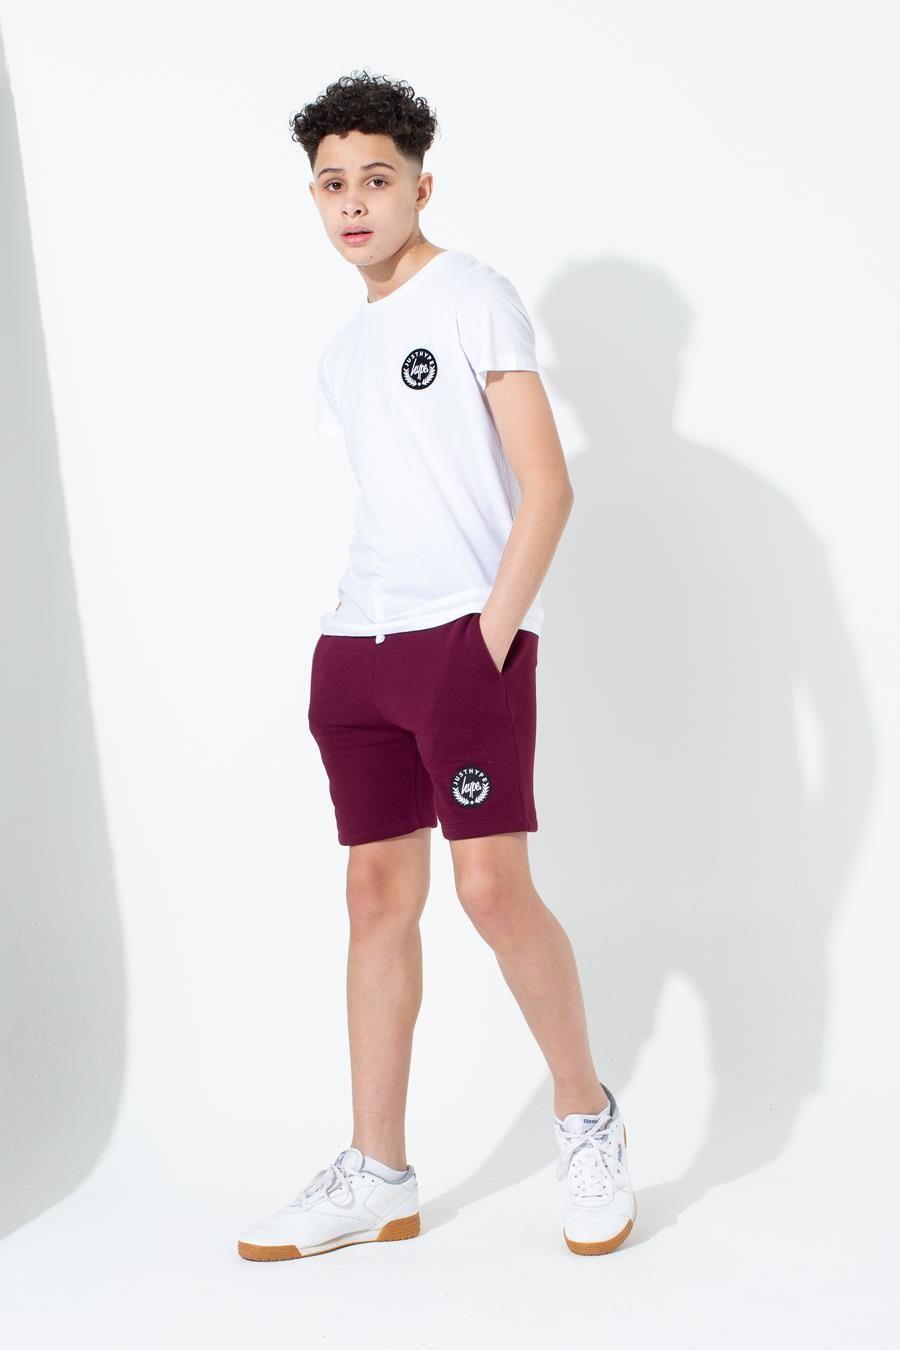 Hype White Crest Kids T-Shirt